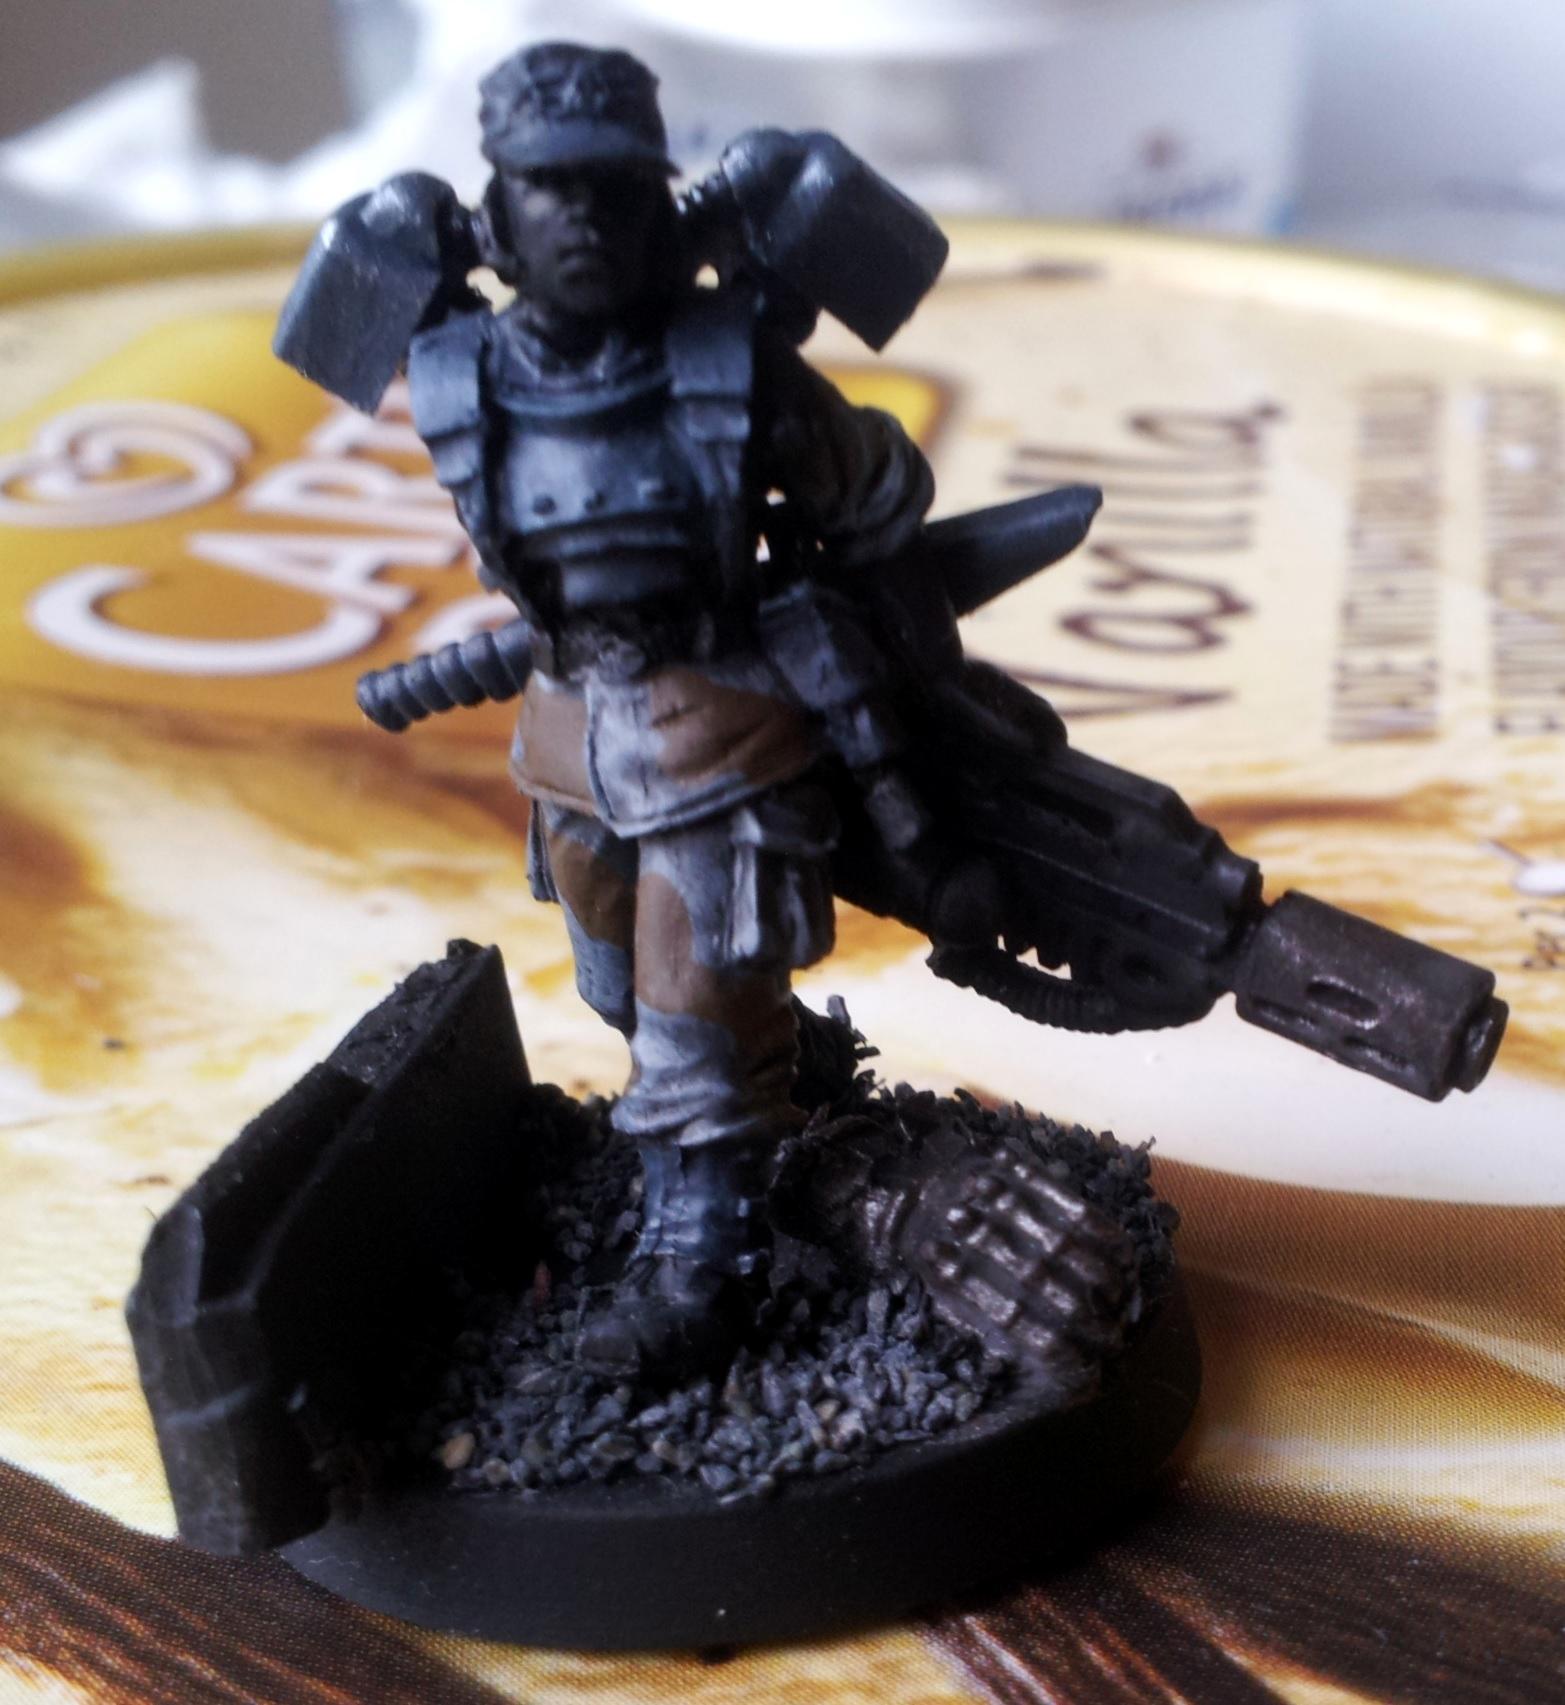 Drop Troops, Female, Gang, Imperial Guard, Inquisimunda, Kill Team, Necromunda, Vic, Victoria Miniatures, Warband, Work In Progress